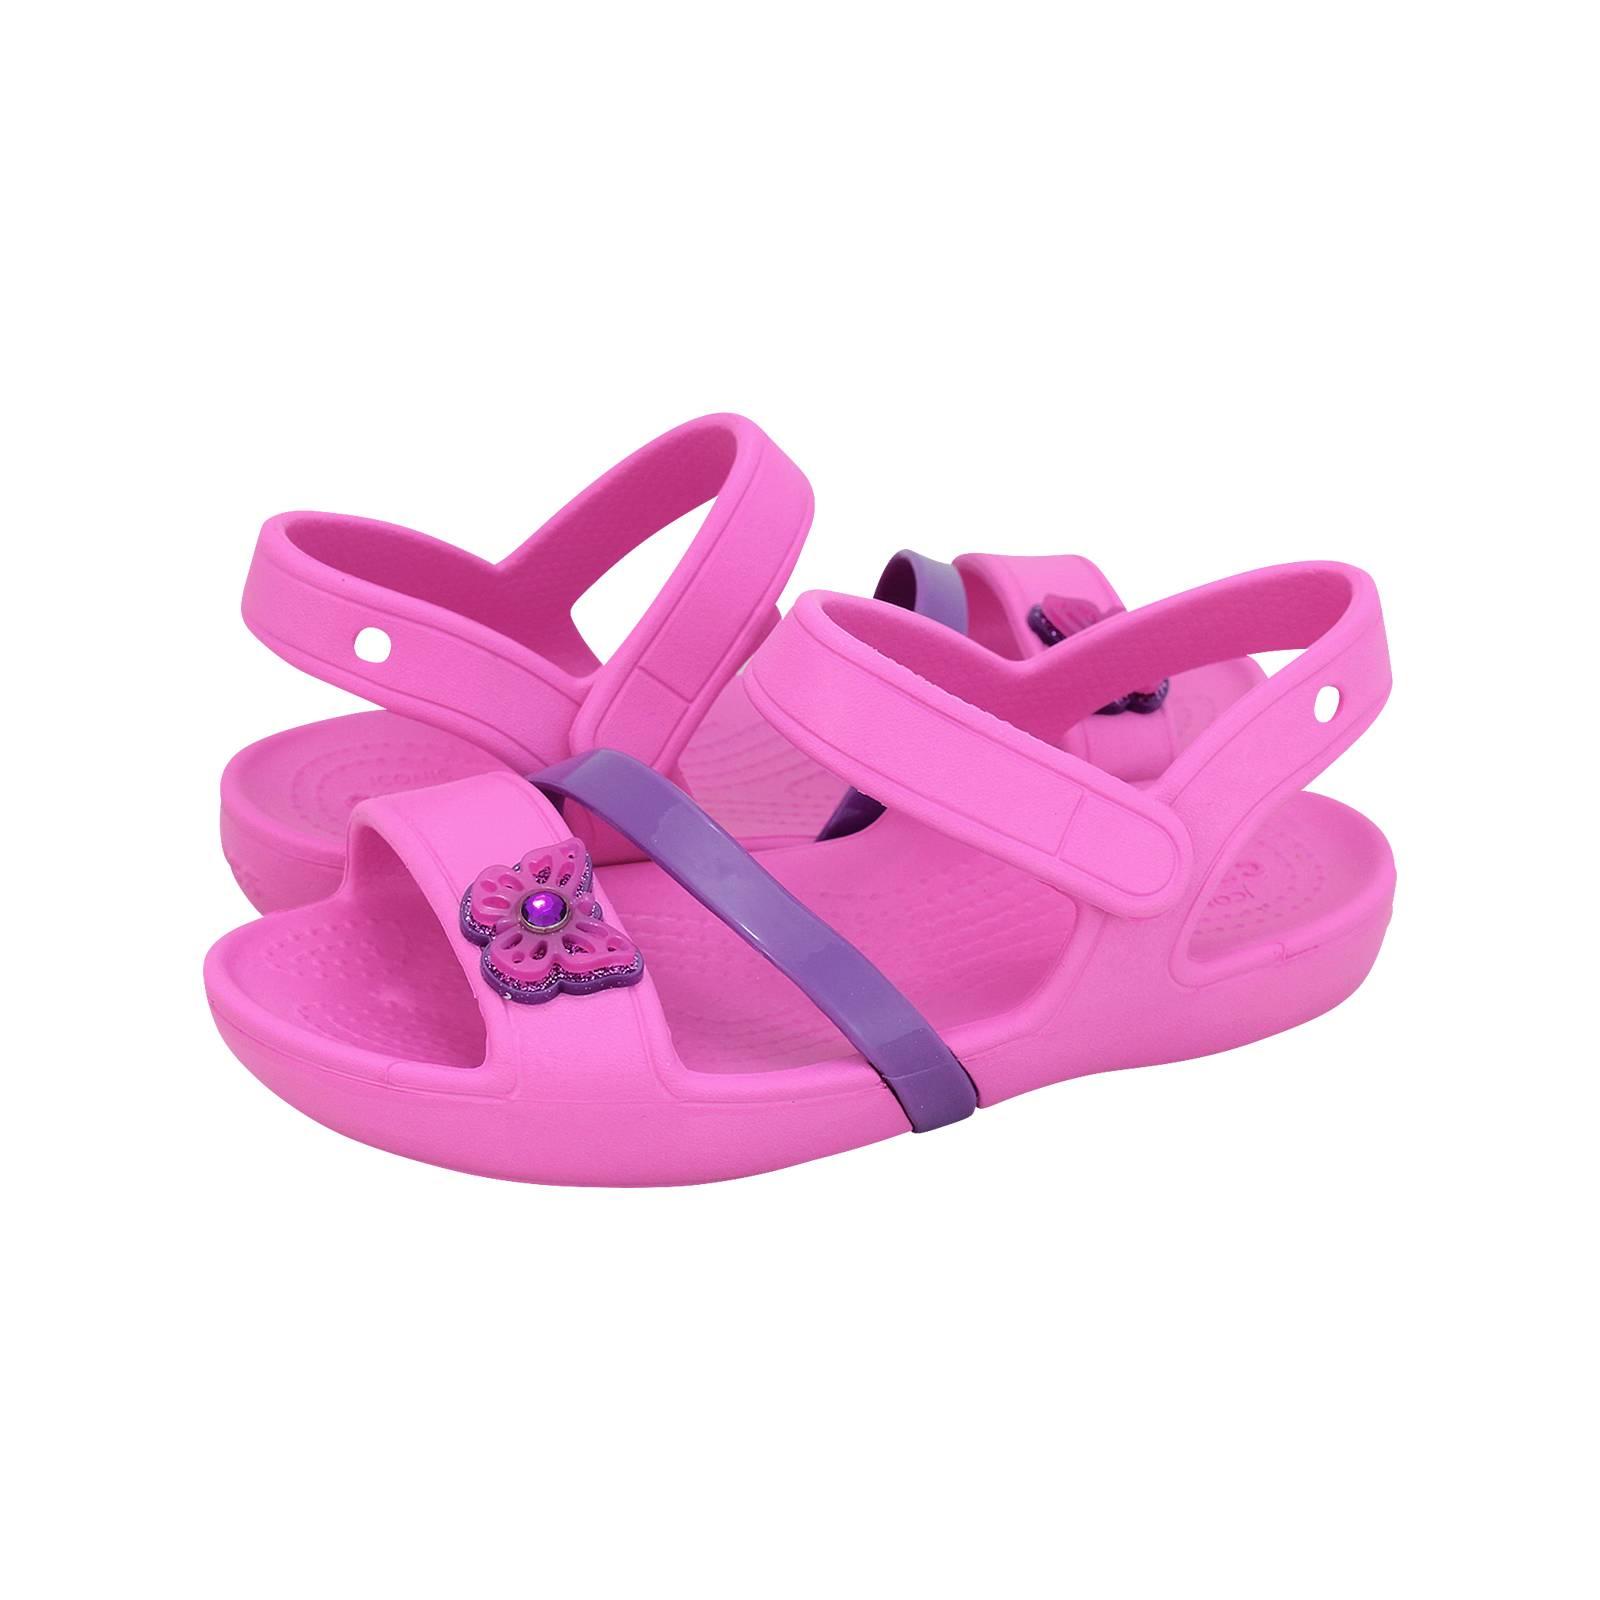 3b9b9fc937f Lina Sandal - Crocs Kids  sandals made of croslite - Gianna Kazakou ...